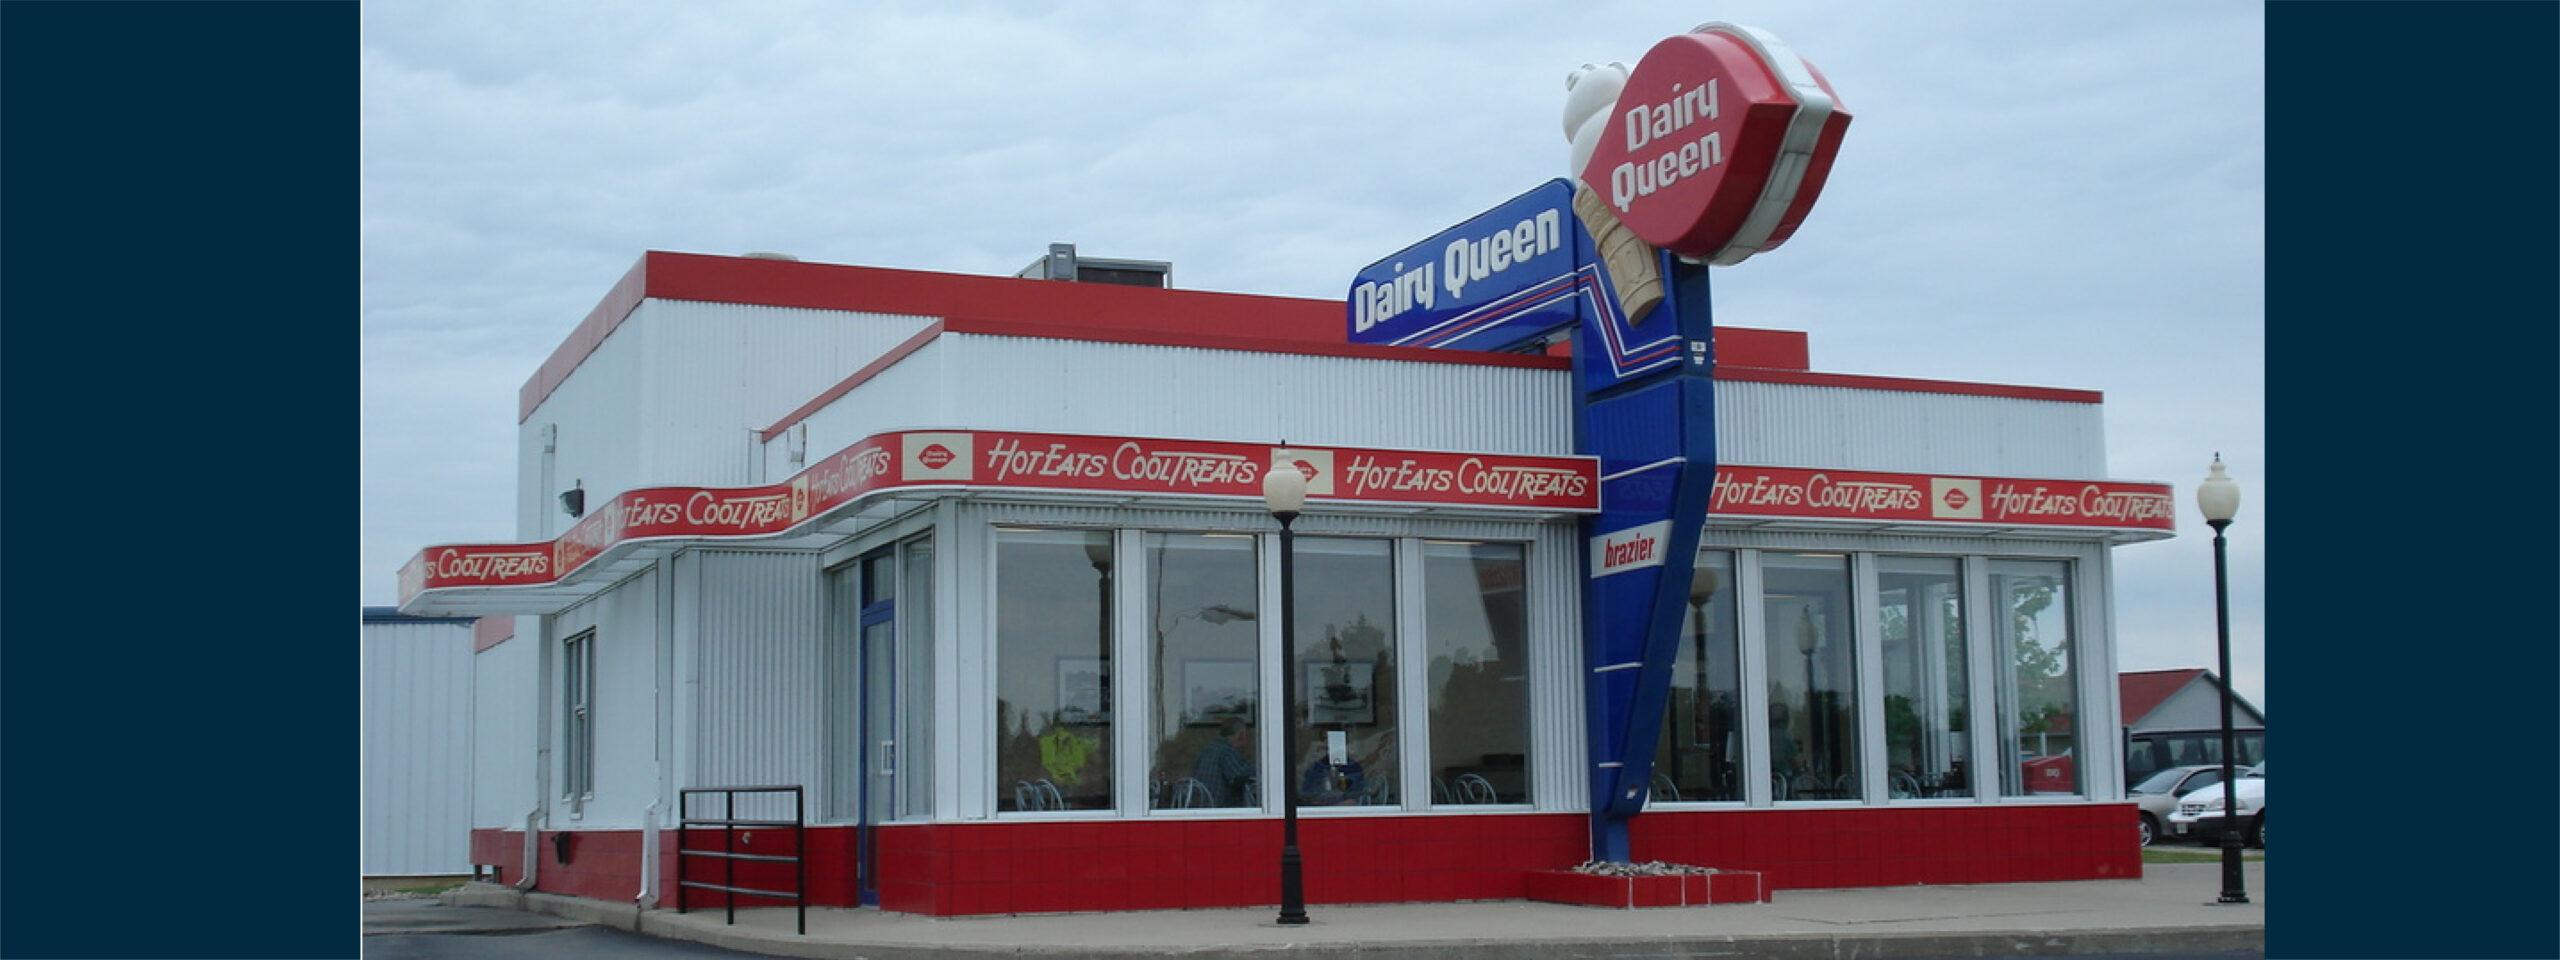 Caledonia, MN Fourteen Foods DQ Restaurant